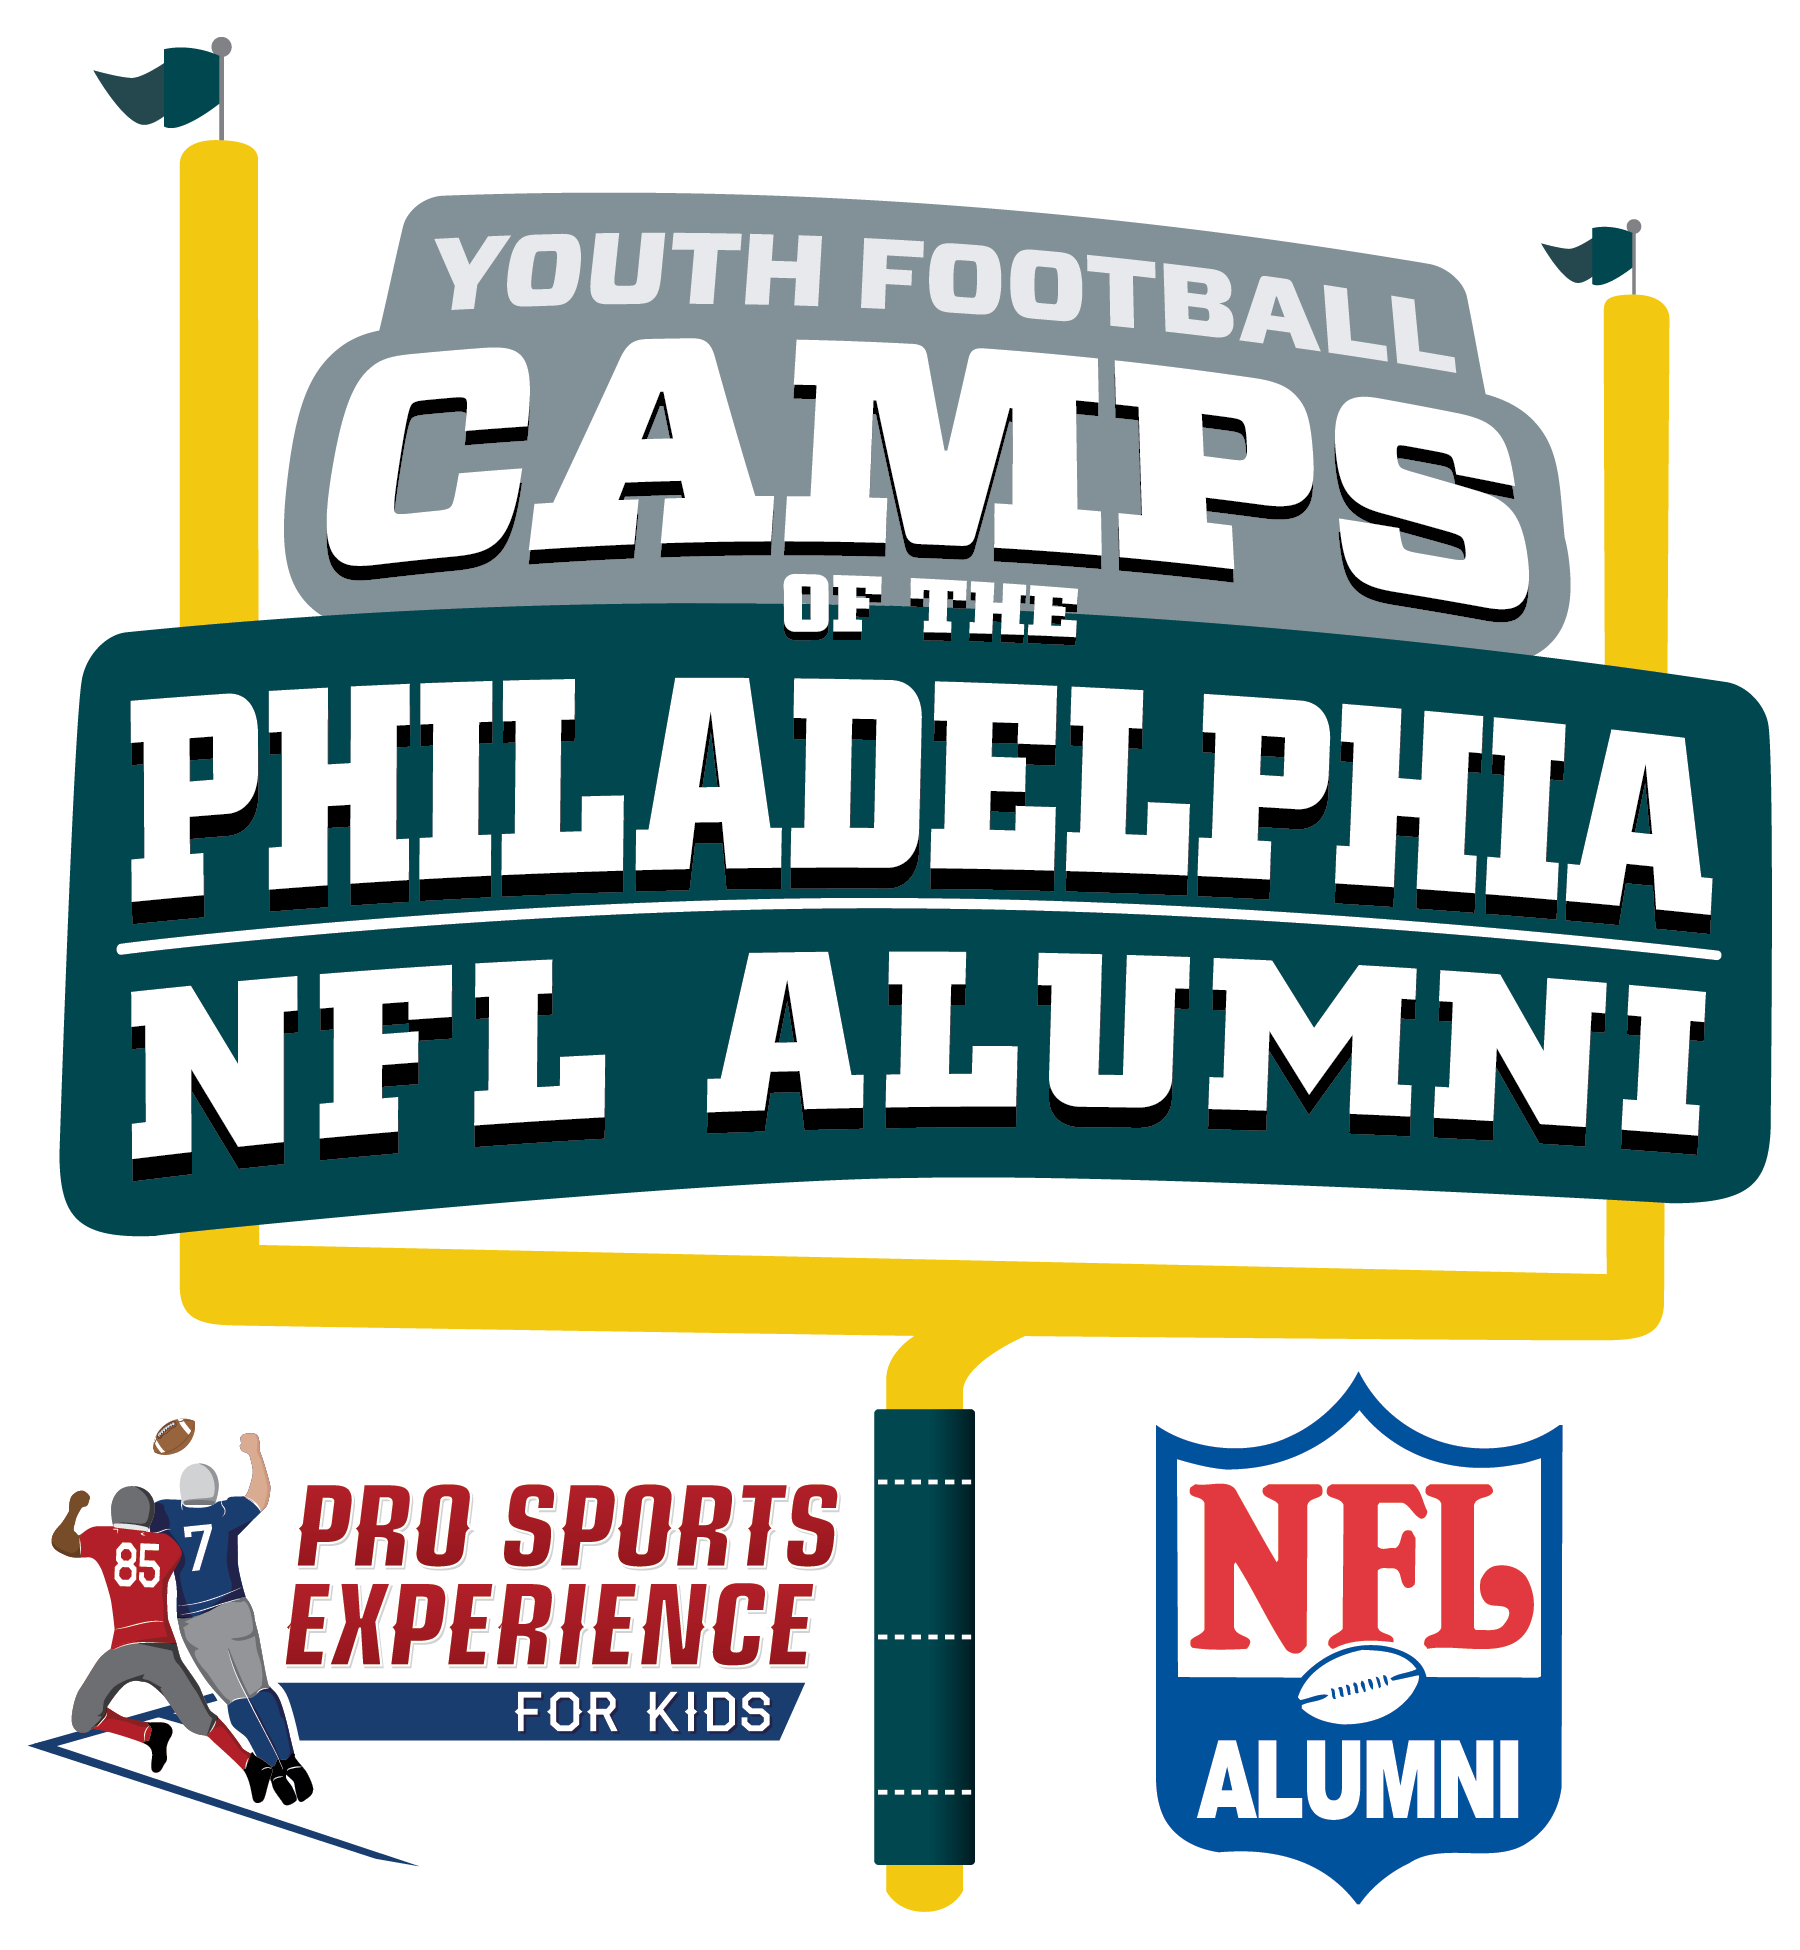 Philadelphia NFL Alumni Hero Youth Football Camps - West Chester